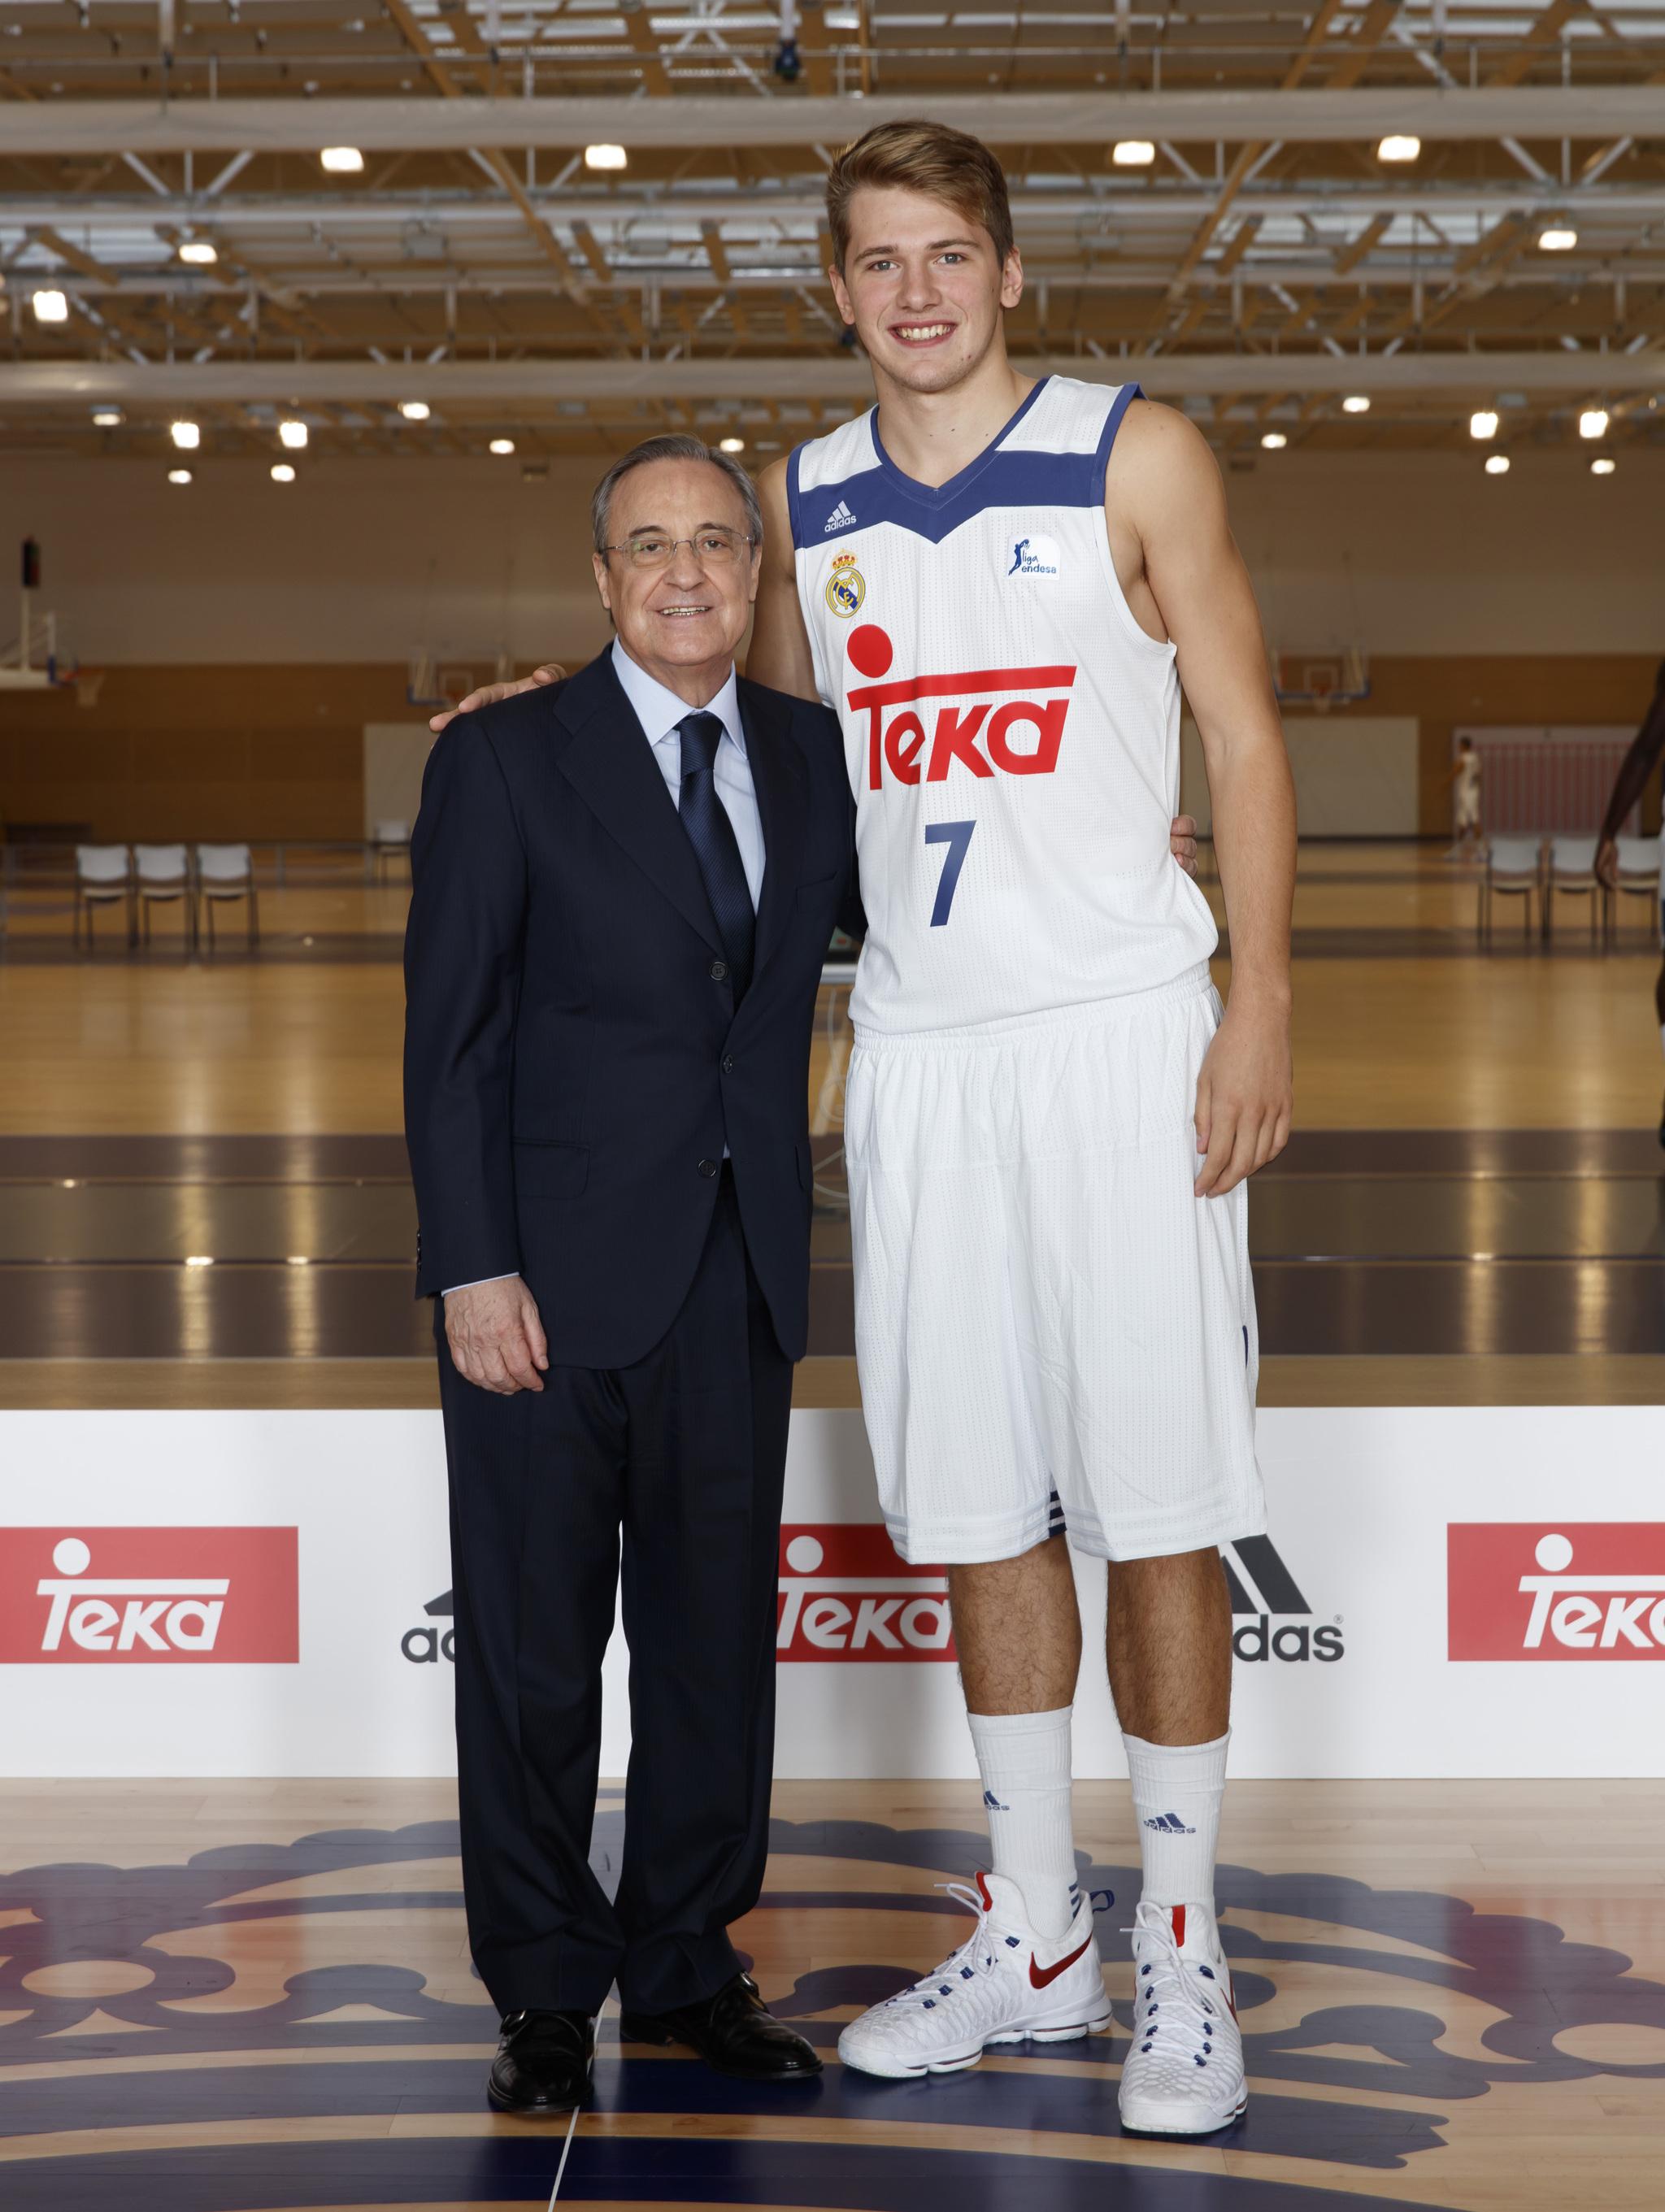 ¿Cuánto mide Florentino Pérez? - Altura - Real height 14743478739237